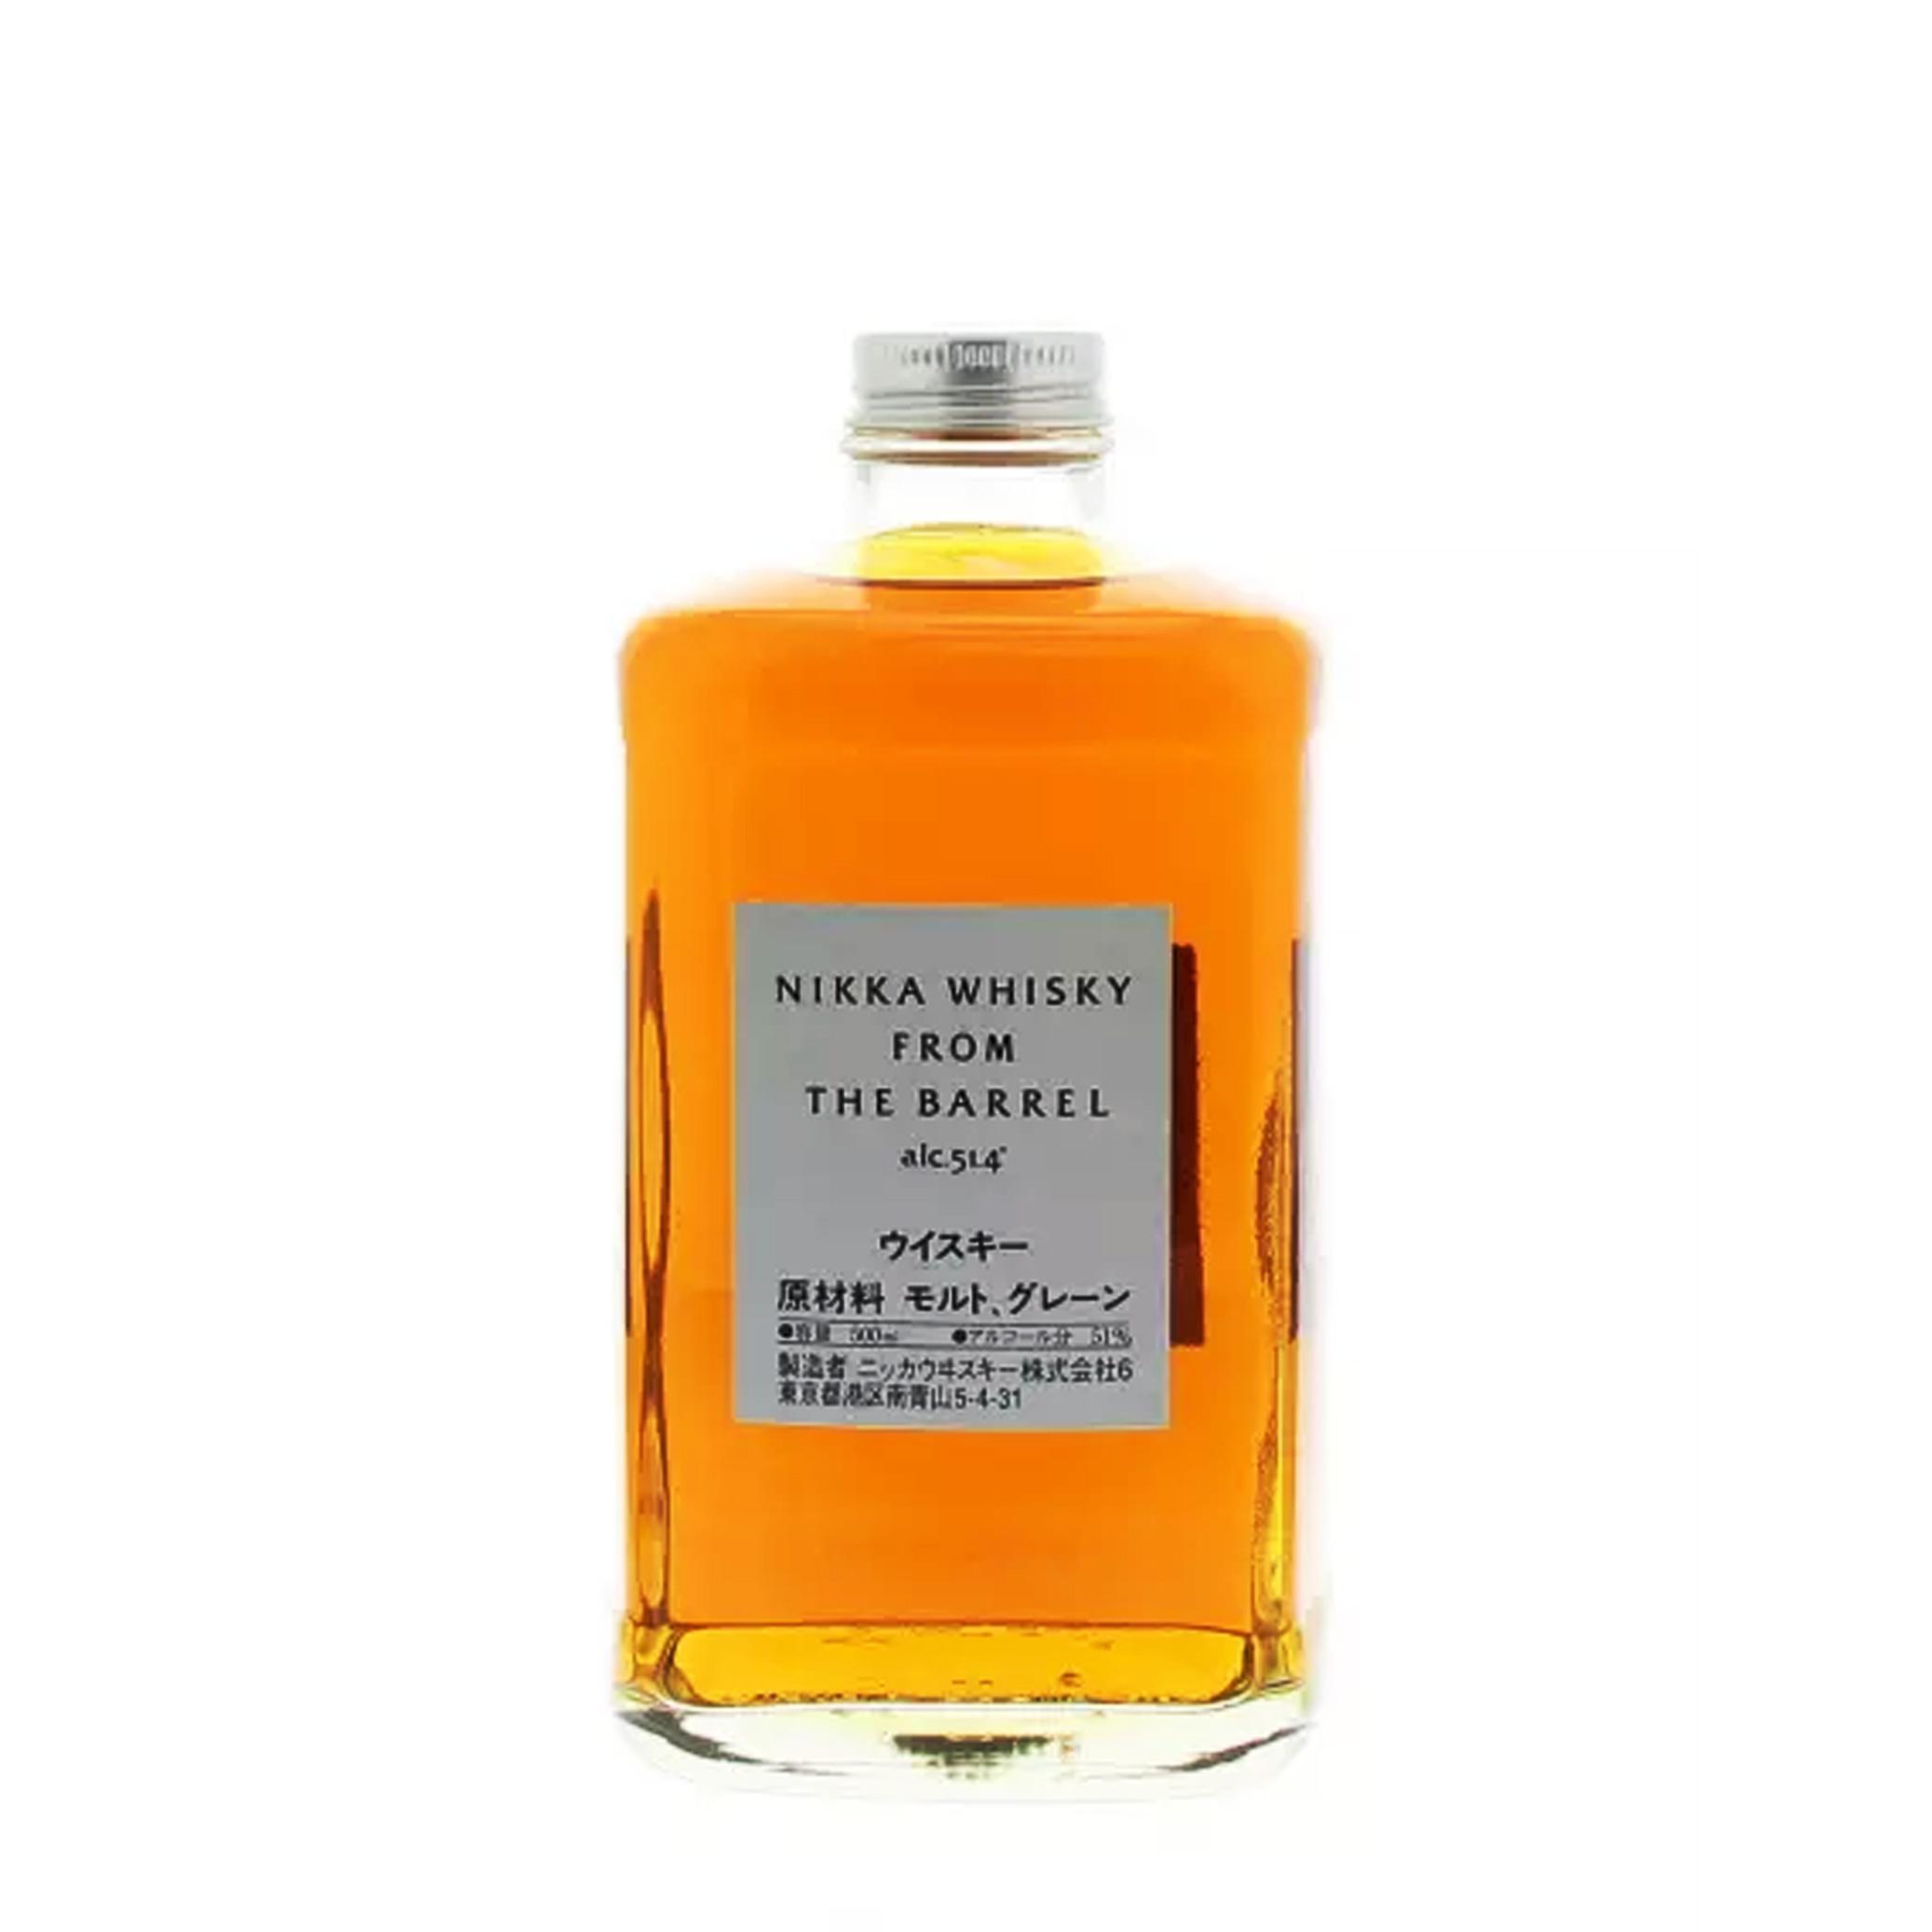 Nikka From The Barrel - Japon - Blended - Non Tourbé - 50cl - 51.4°